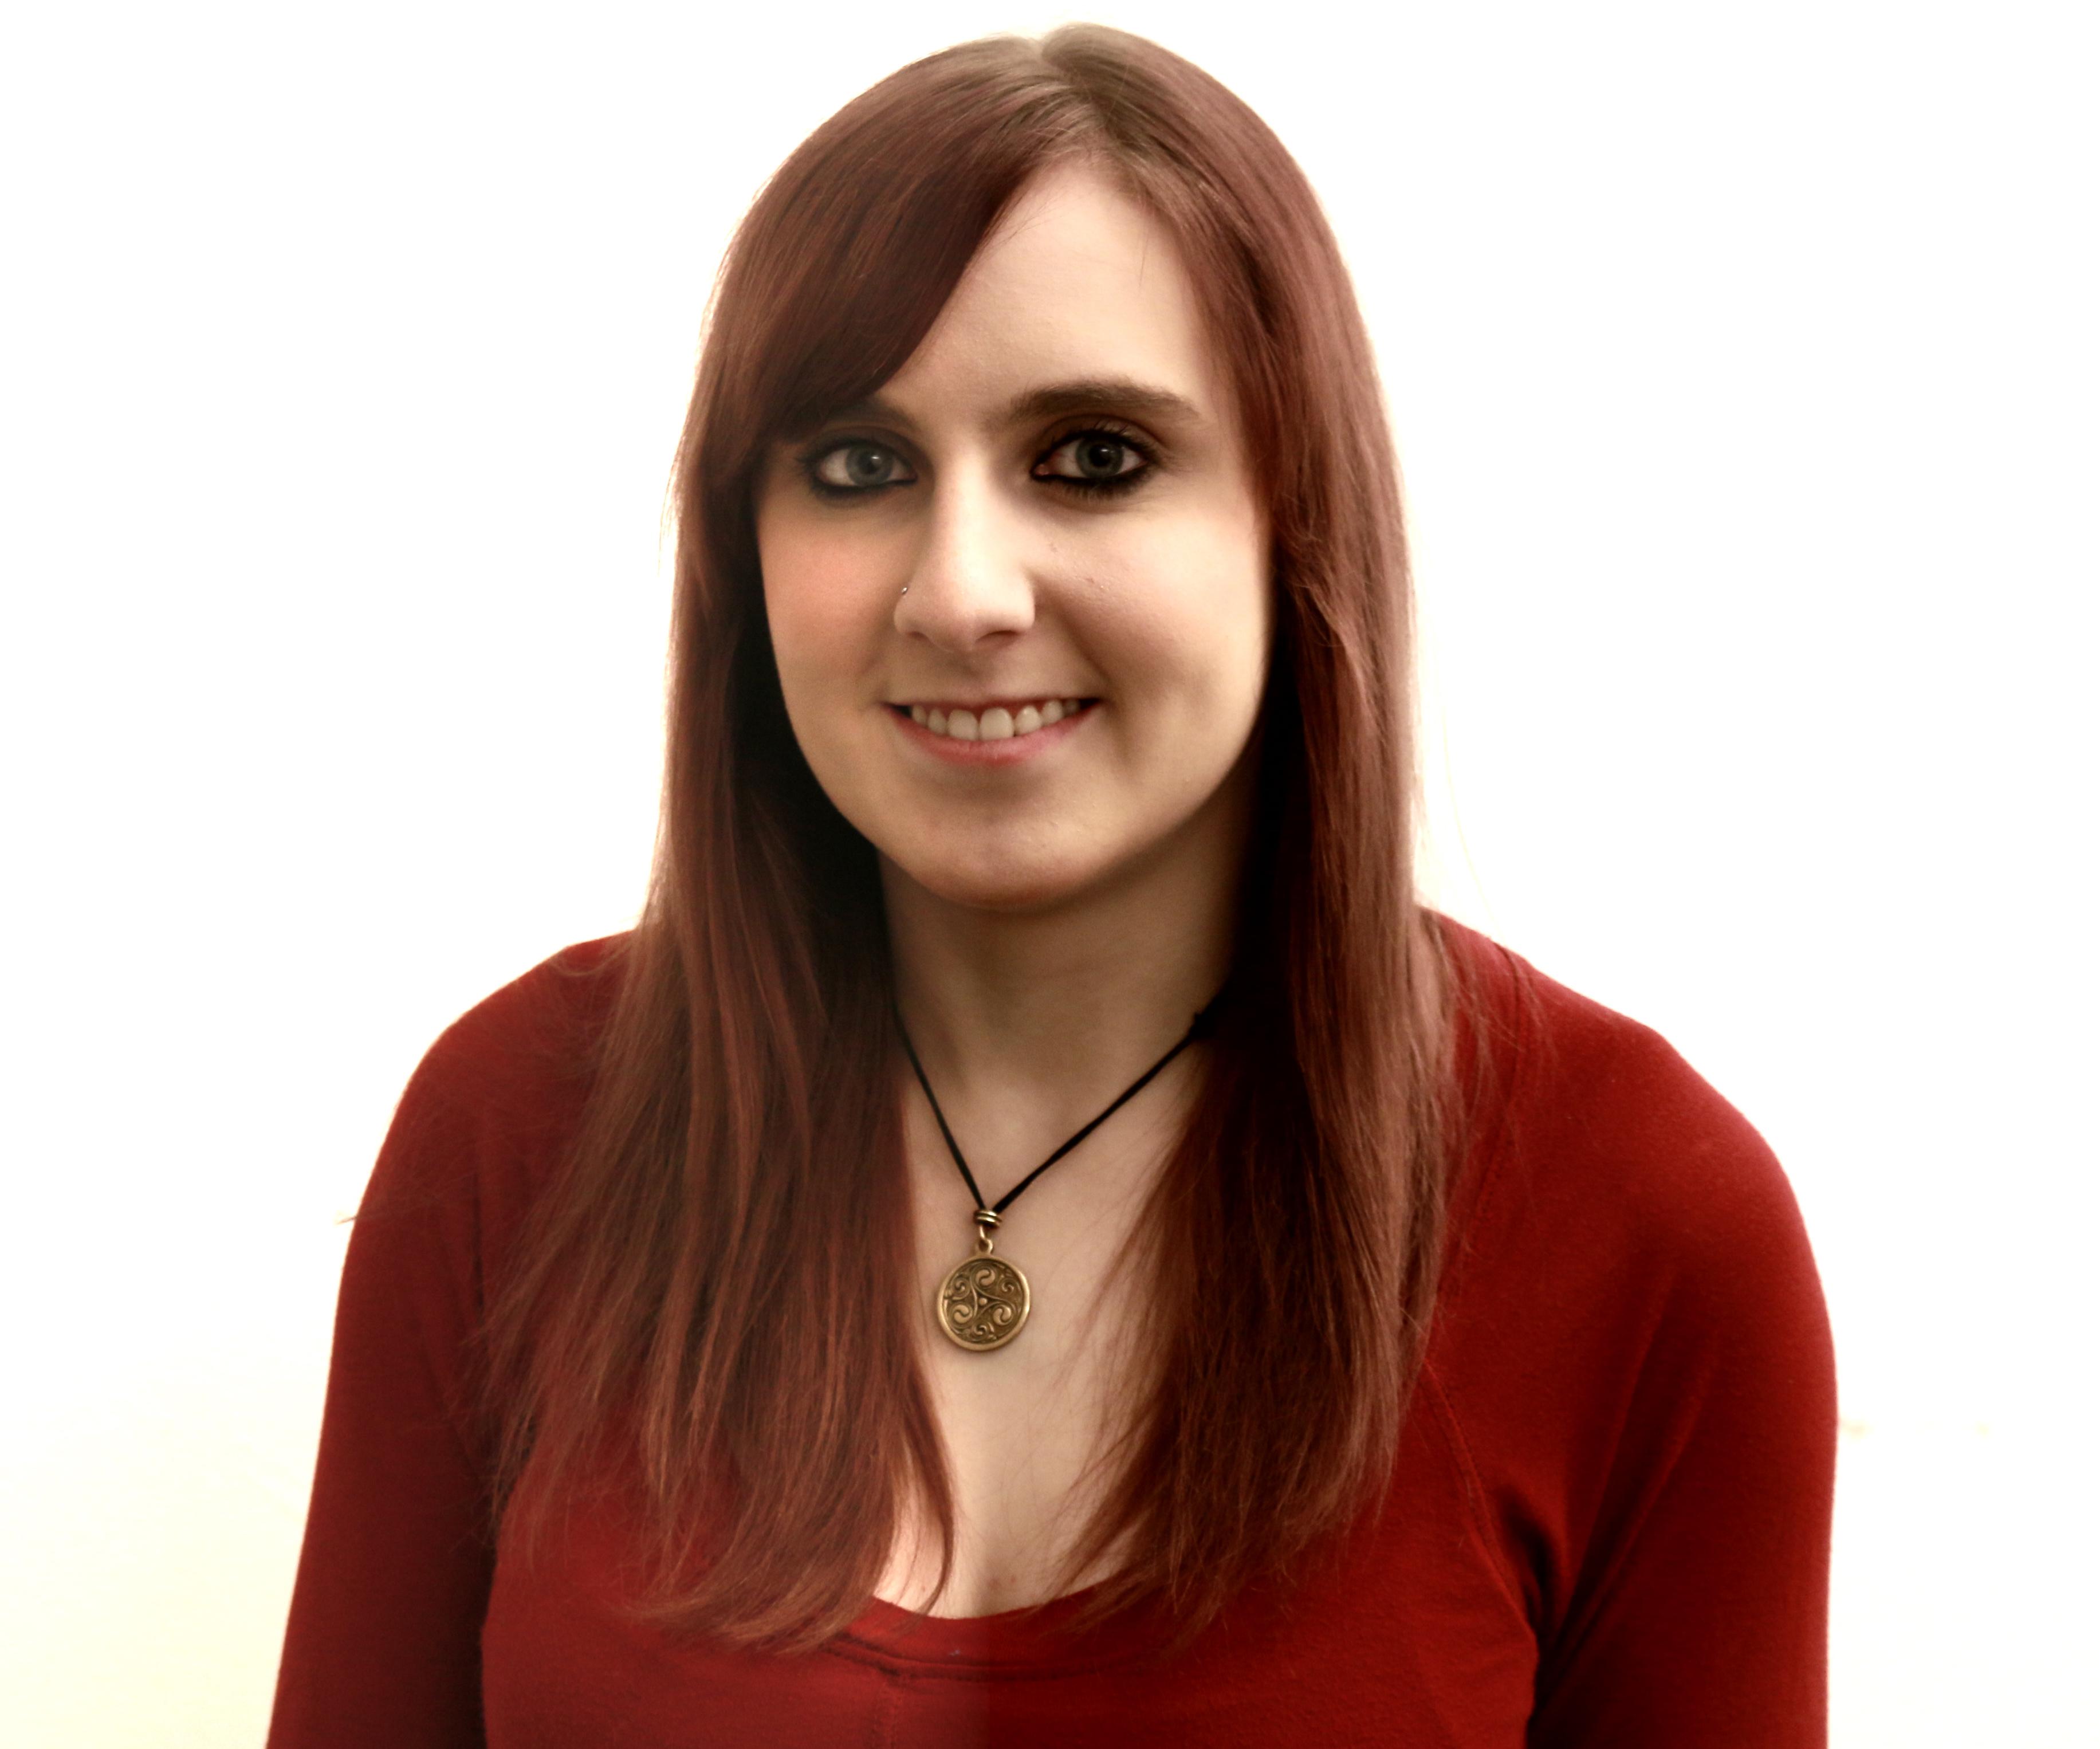 Ashley- Microsoft Office Specialist